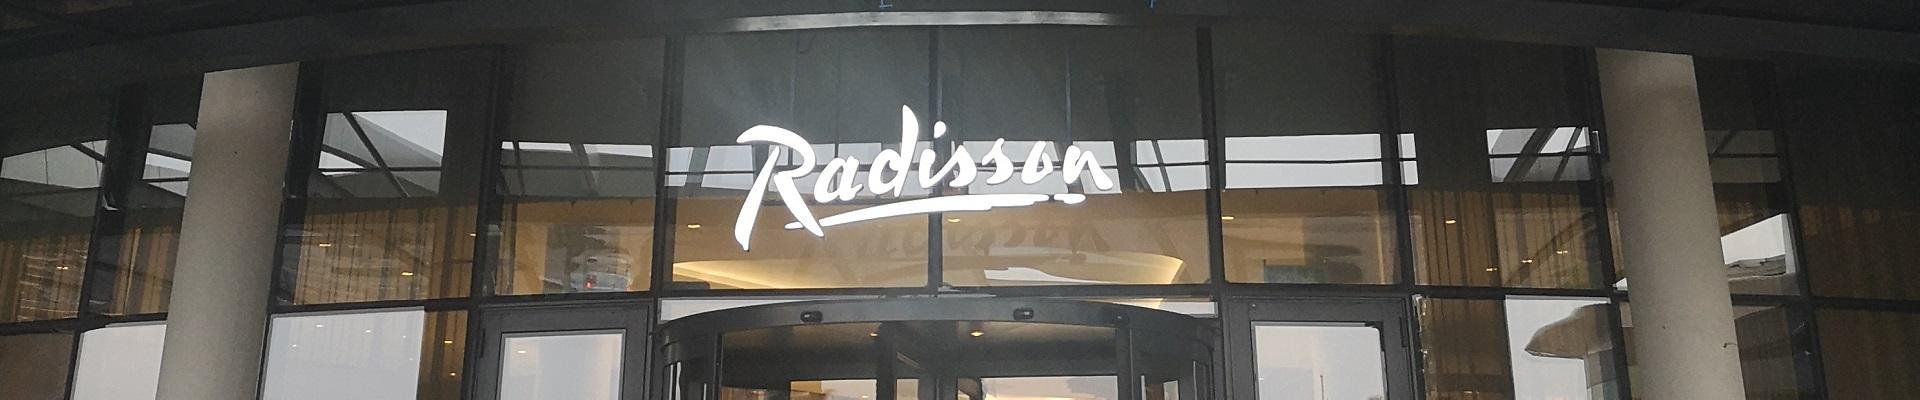 Radisson Hotel OR Tambo